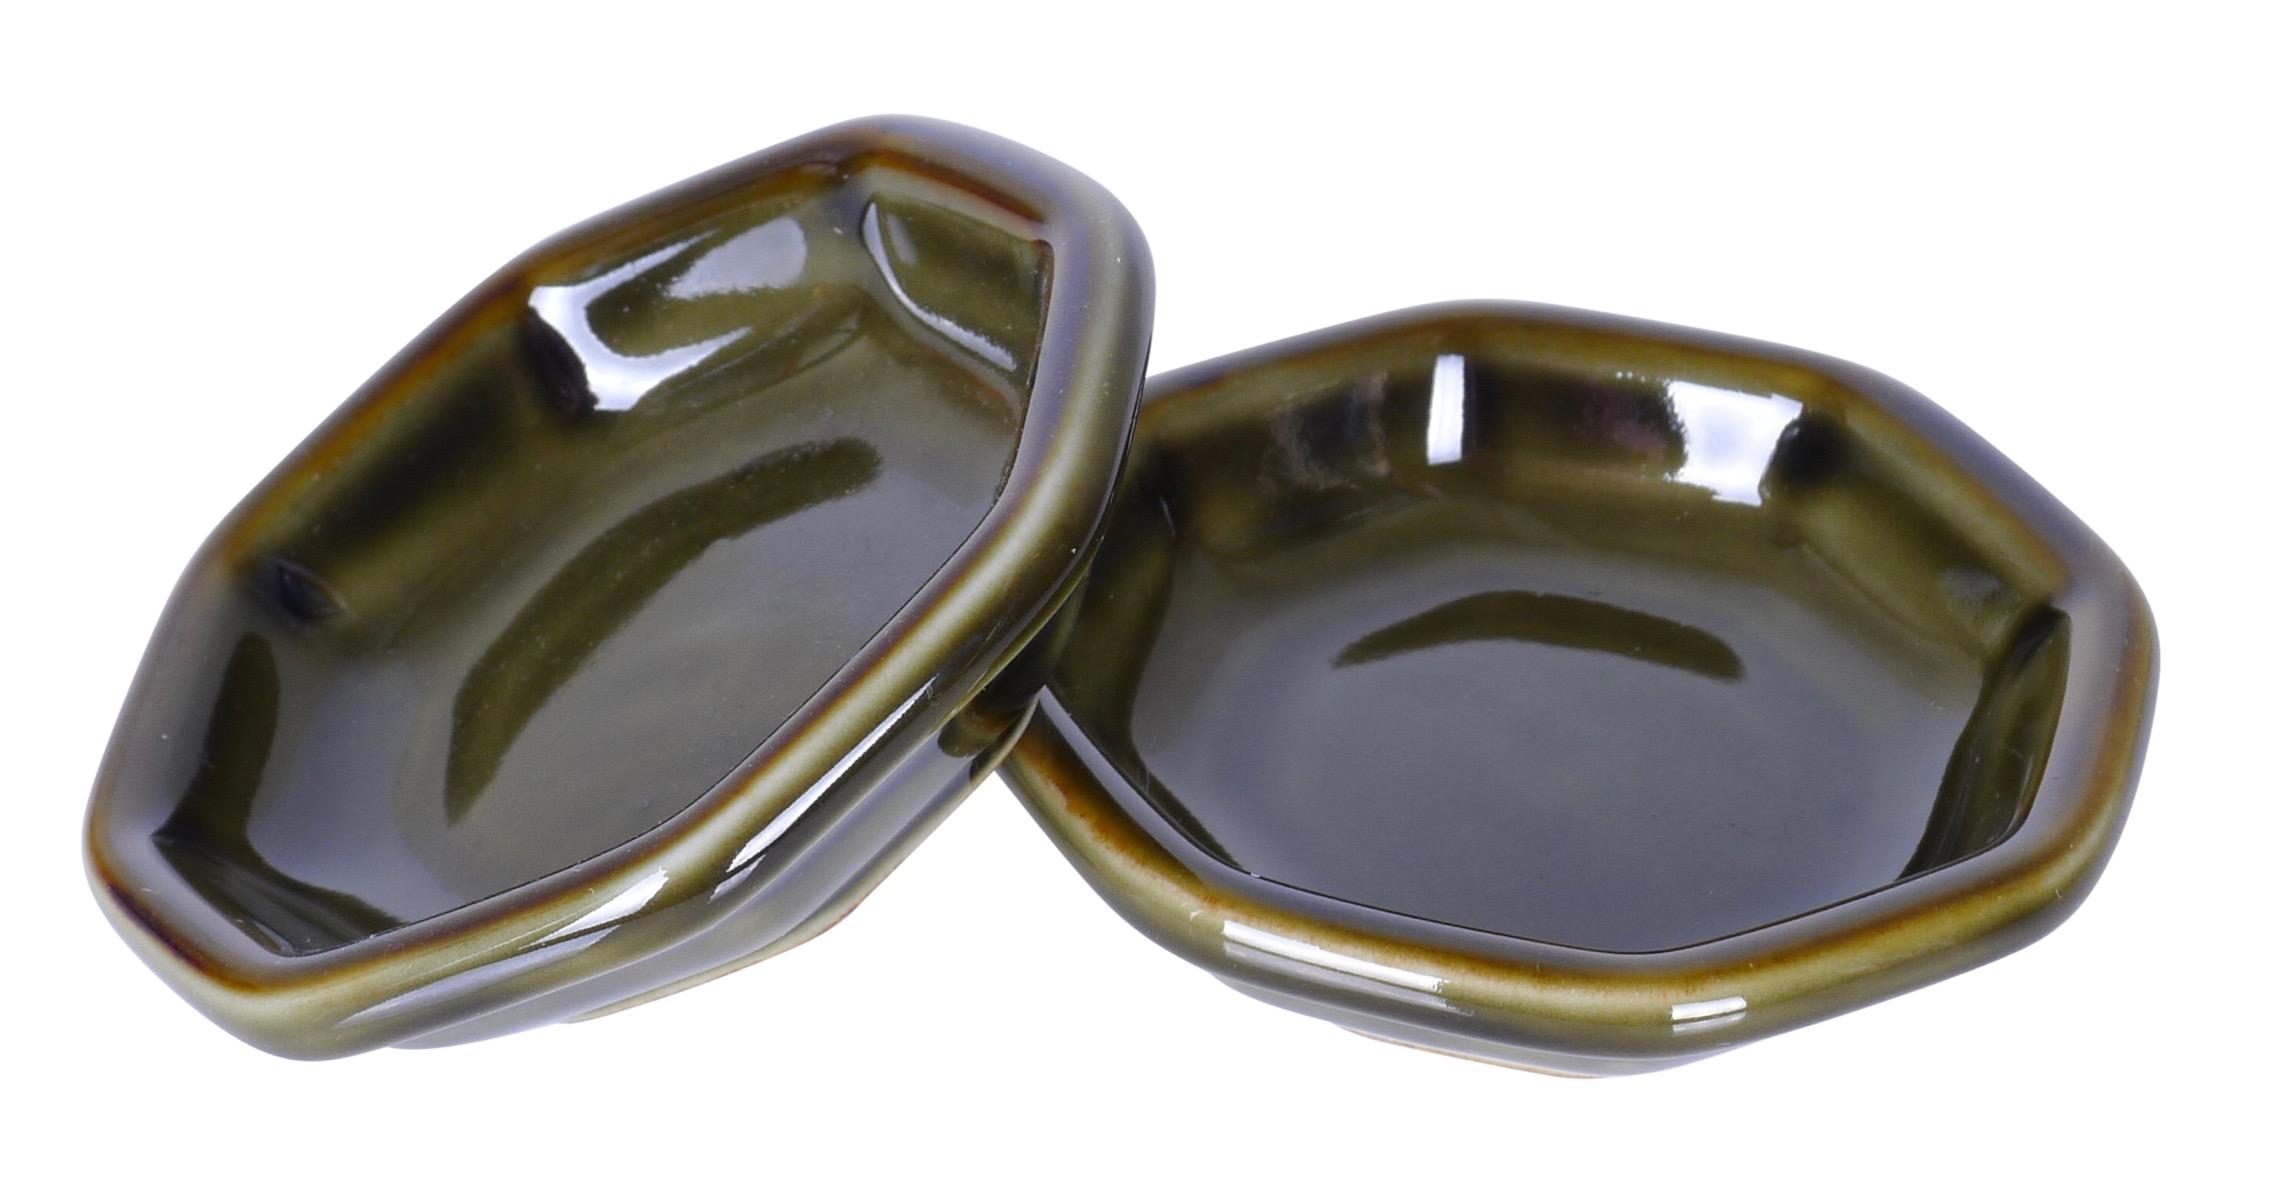 Image of Porcelain Hexagon Appetizer Dish, Green Hexagon  3.5-Inch